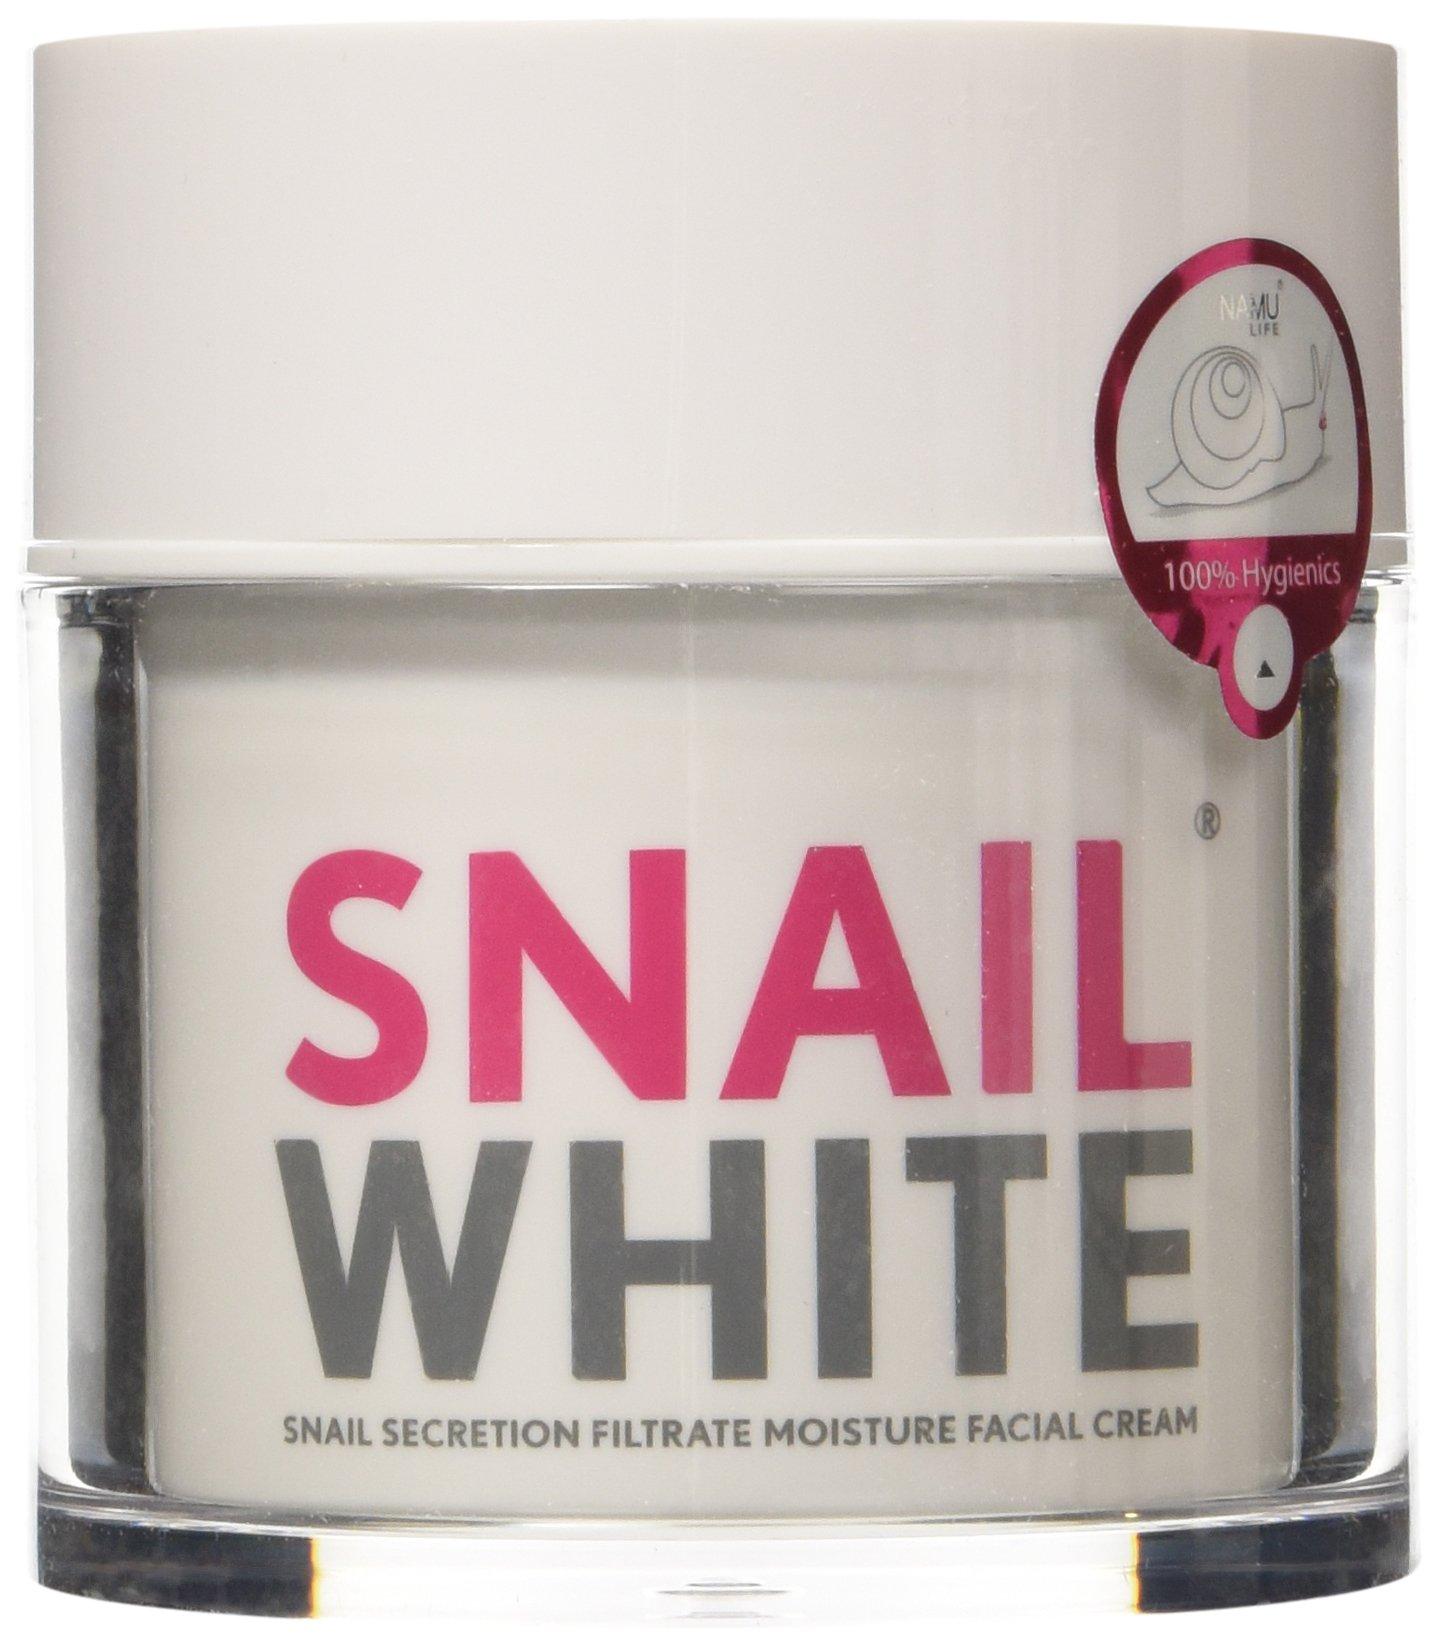 Korea Face Cream Snail White NAMU FACE Cream Skin Regenerate Recovery Renew MOISTURIZER Repairing Net Wt.1.8 Oz or 50 g.